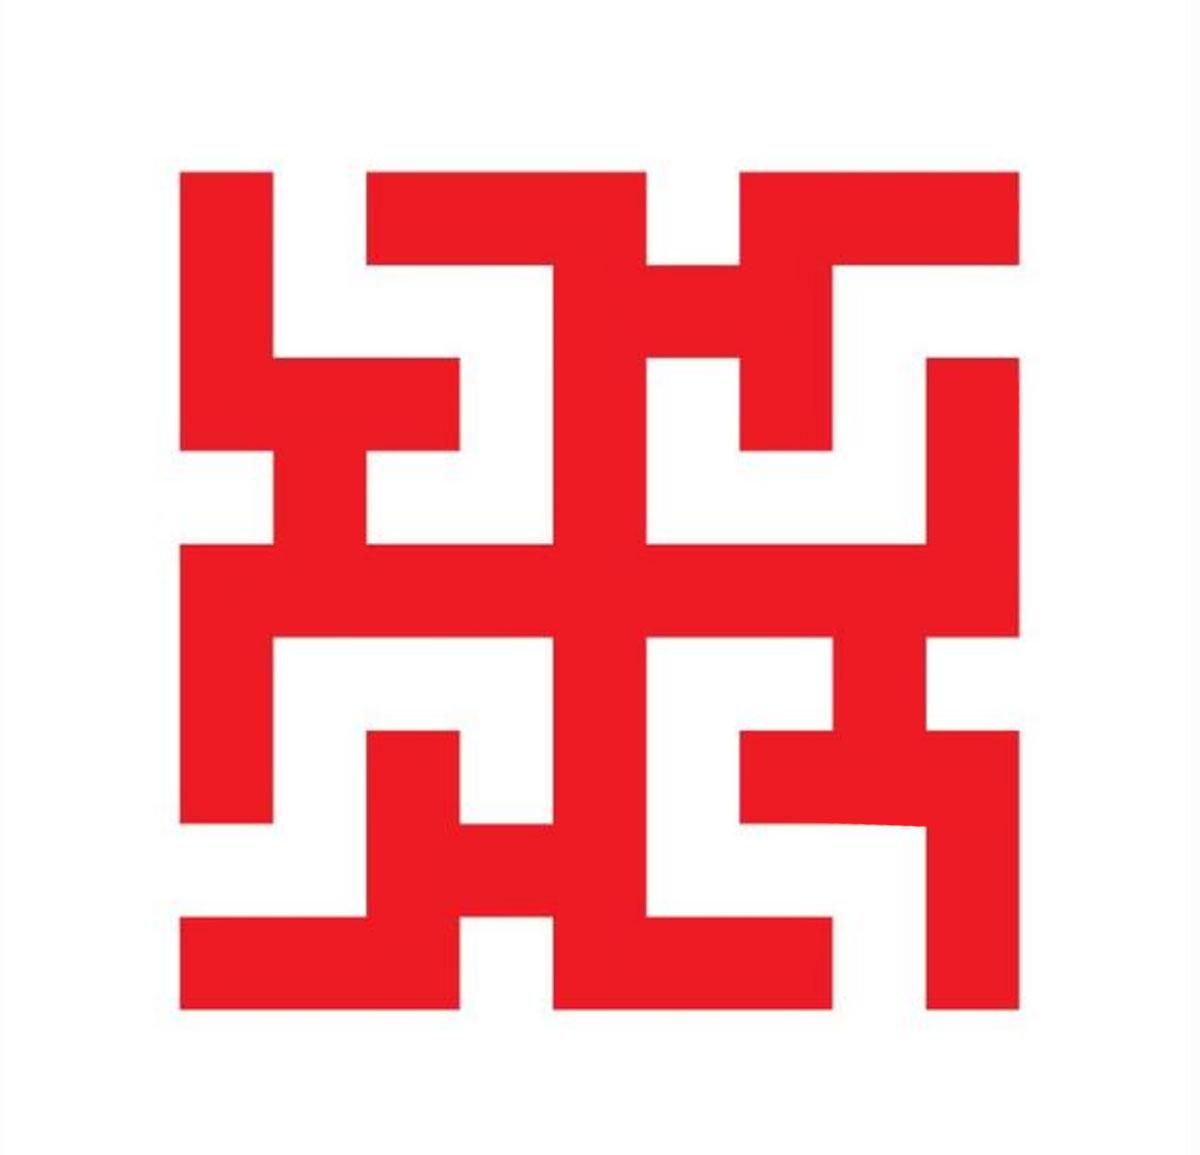 духобор значение символа